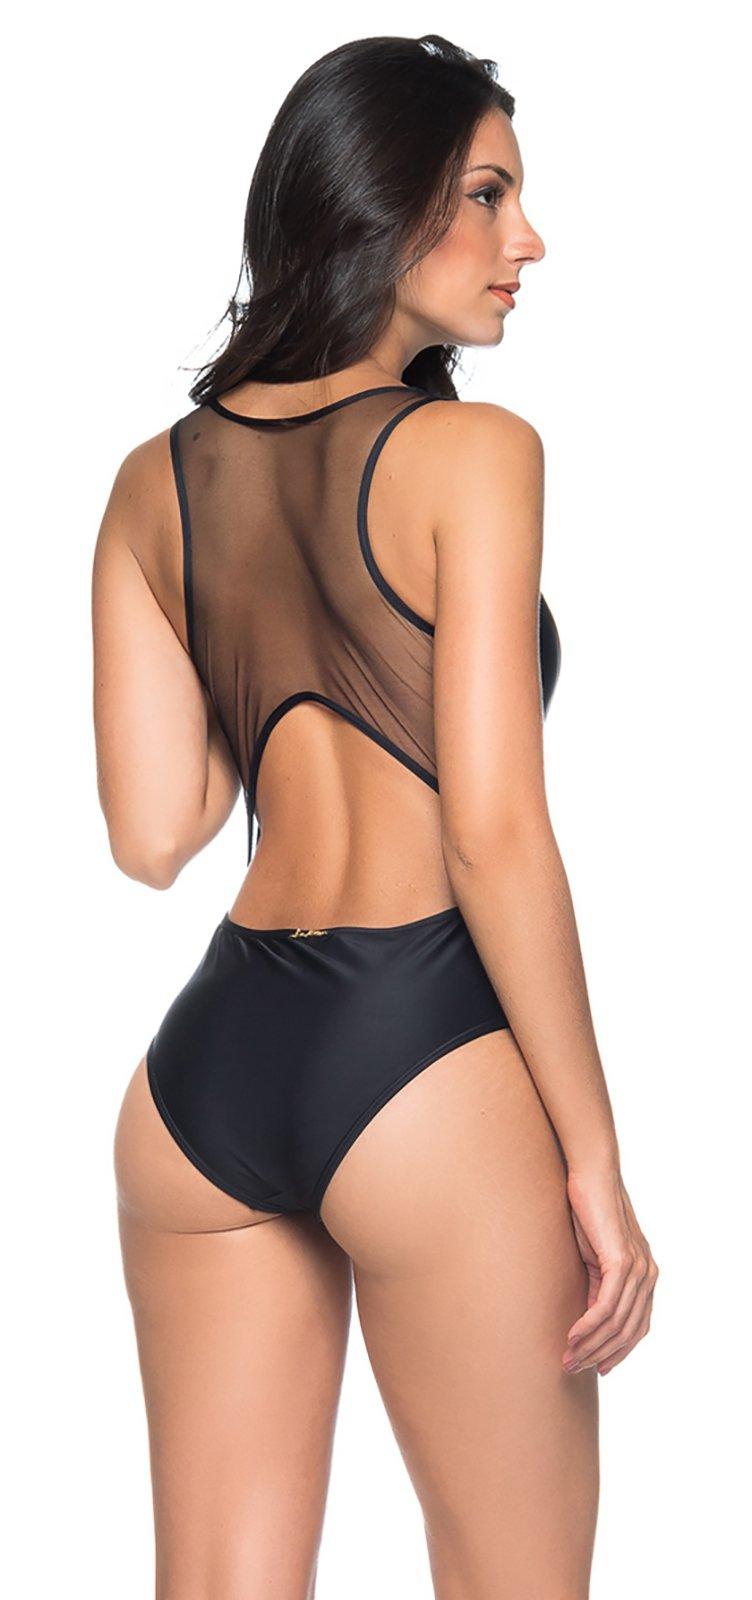 35228b08d Black Swimsuit With A Zipper And Transparent Back - Maio Preto - Lua ...